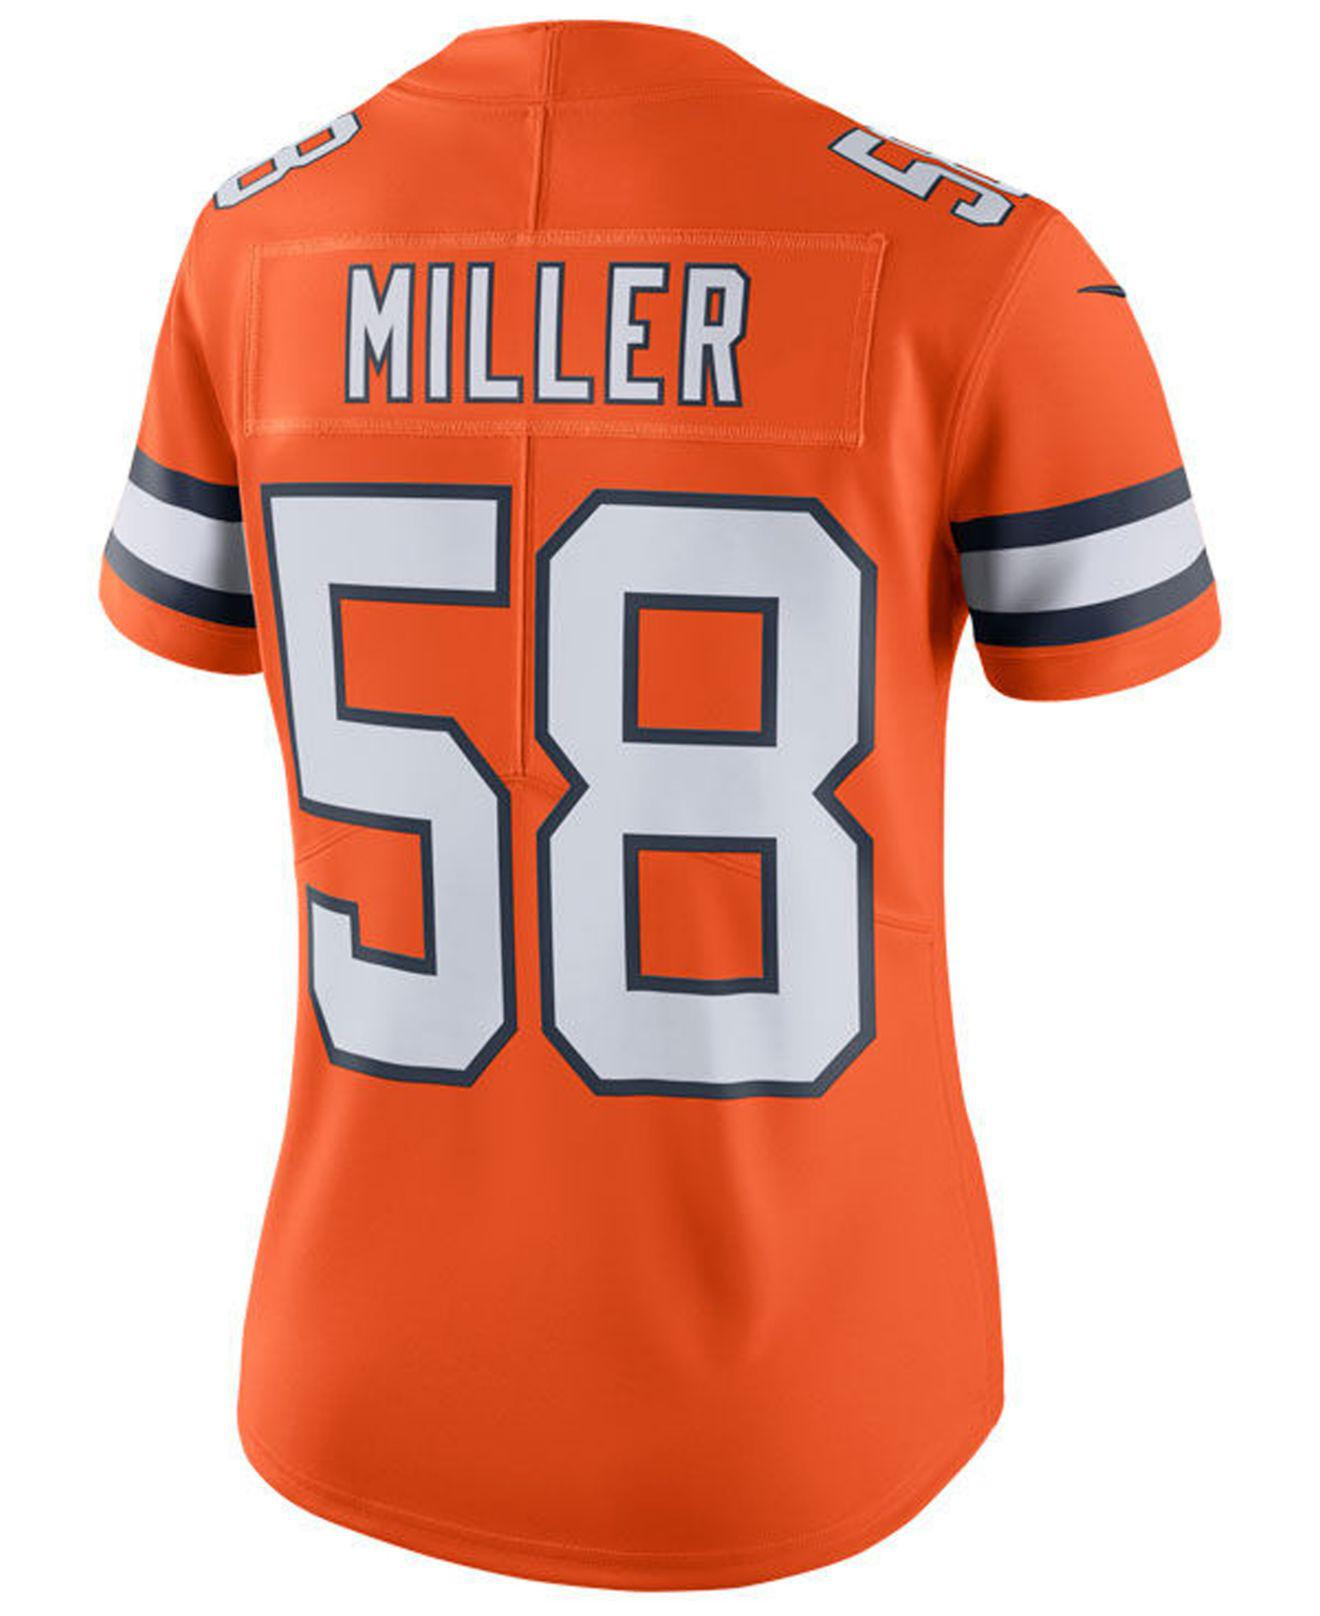 dfb8f4aa2 Nike. Women s Orange Von Miller Denver Broncos Color Rush Limited Jersey